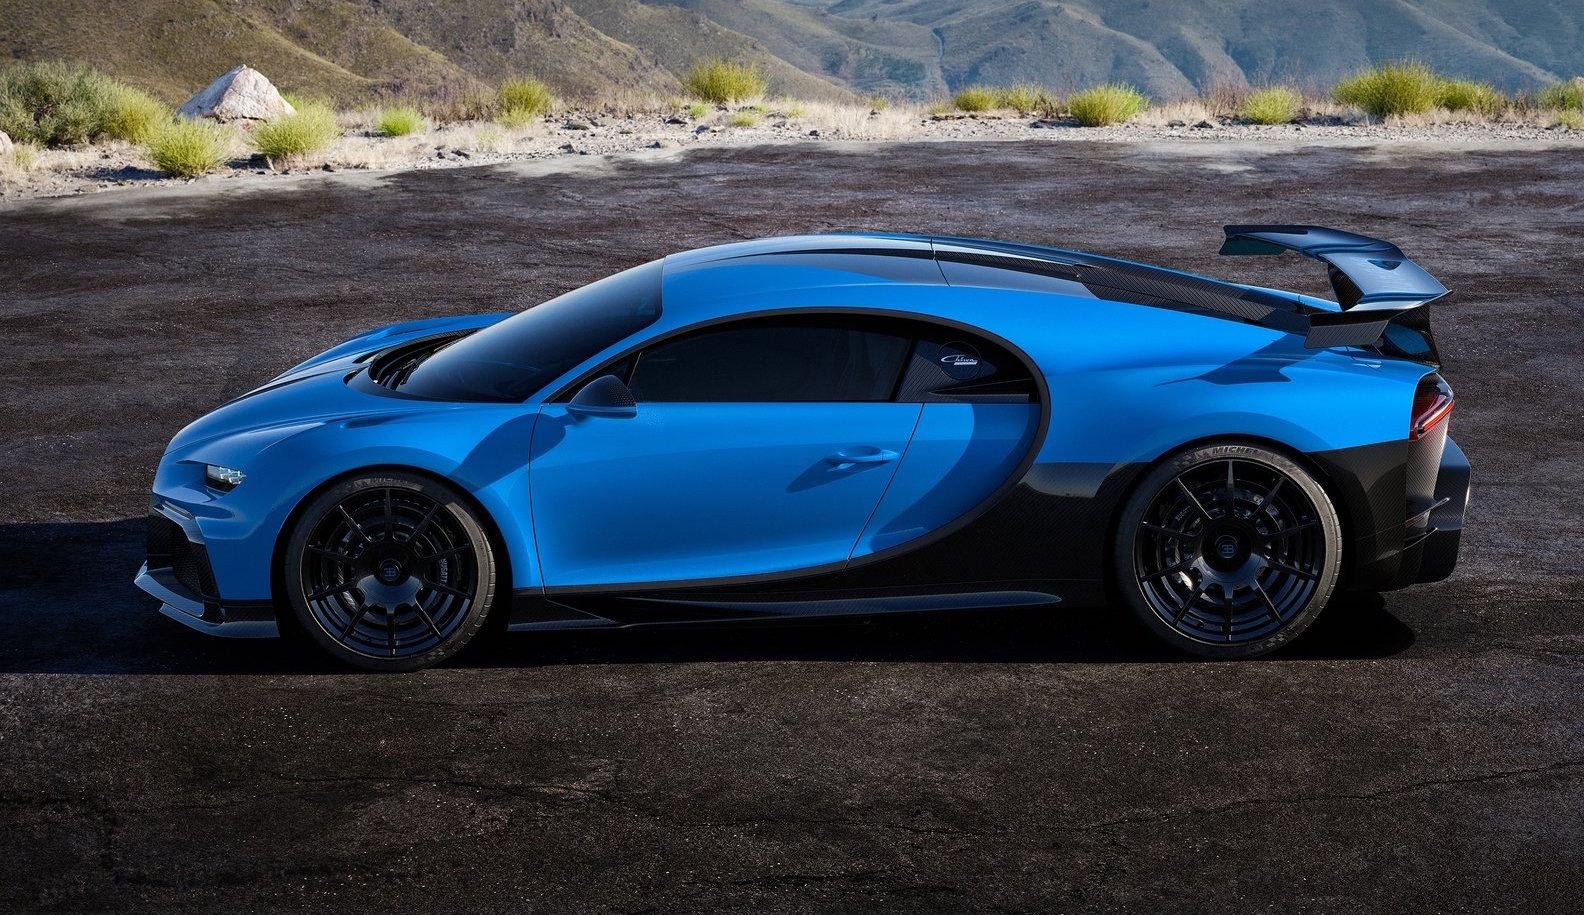 Bugatti Chiron Pur Sport Spotted Testing At Nurburgring Epic Speed Video Performancedrive